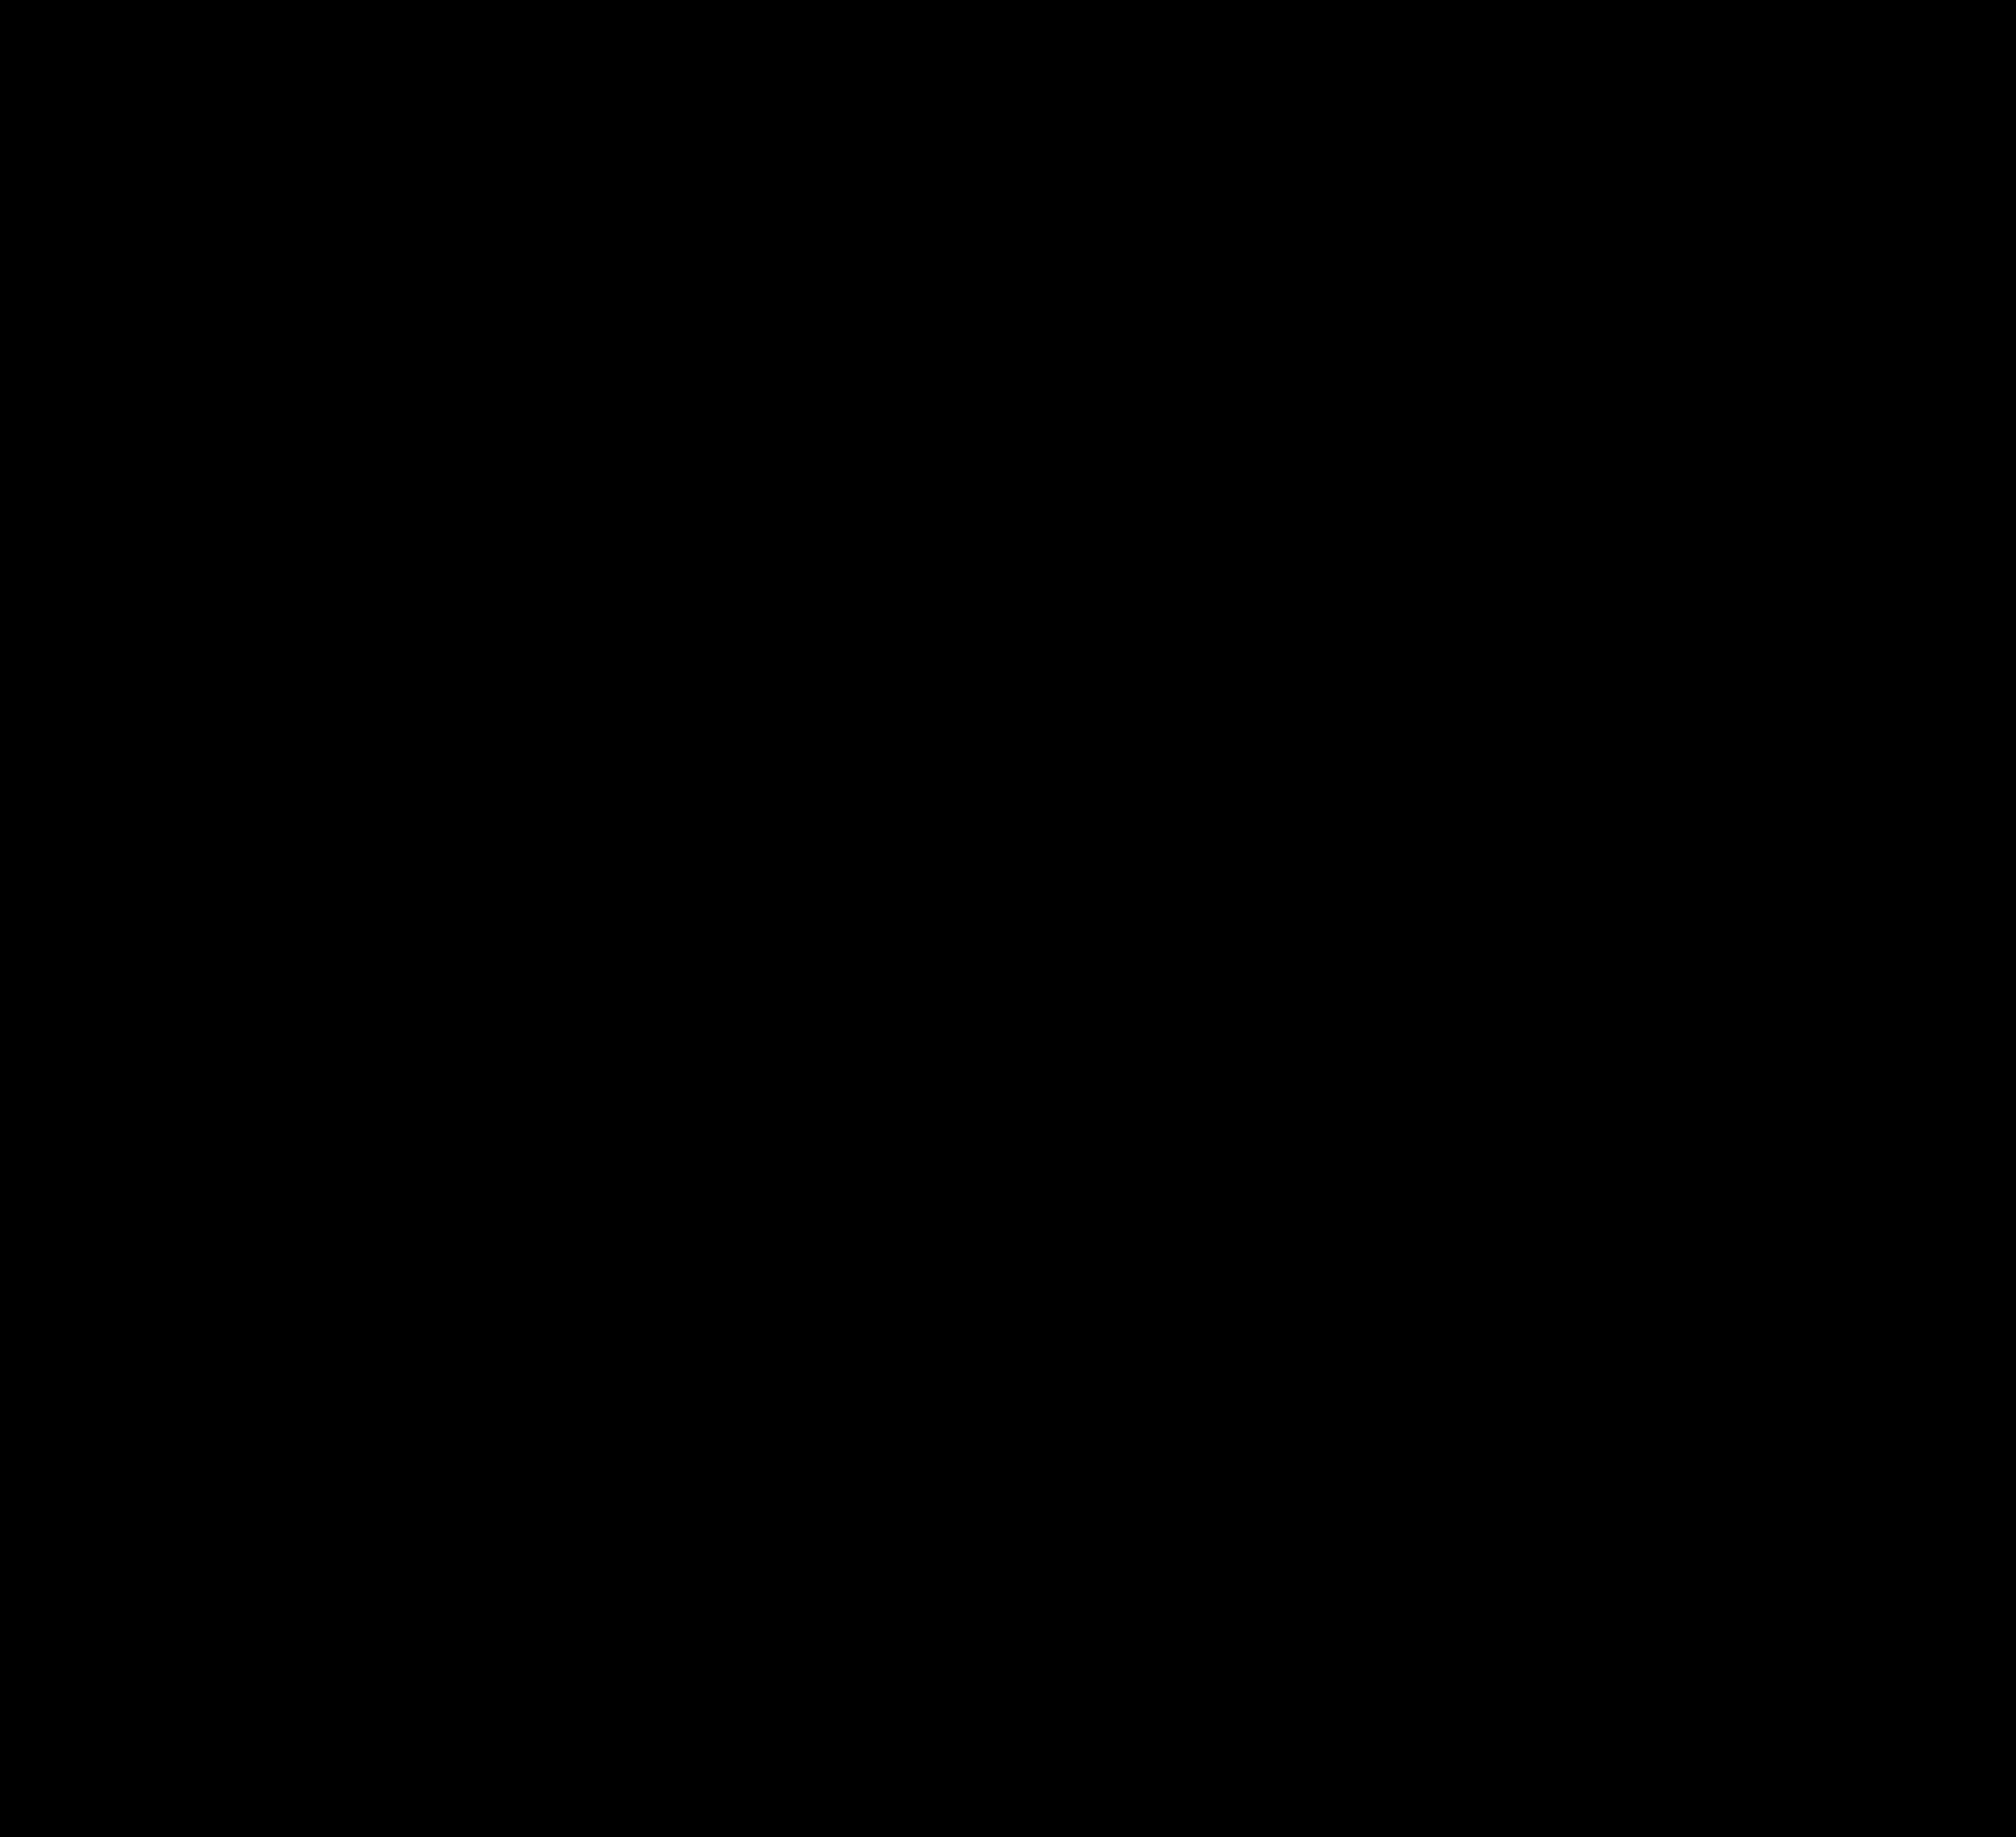 6900x6287 Black Fireworks Silhouette